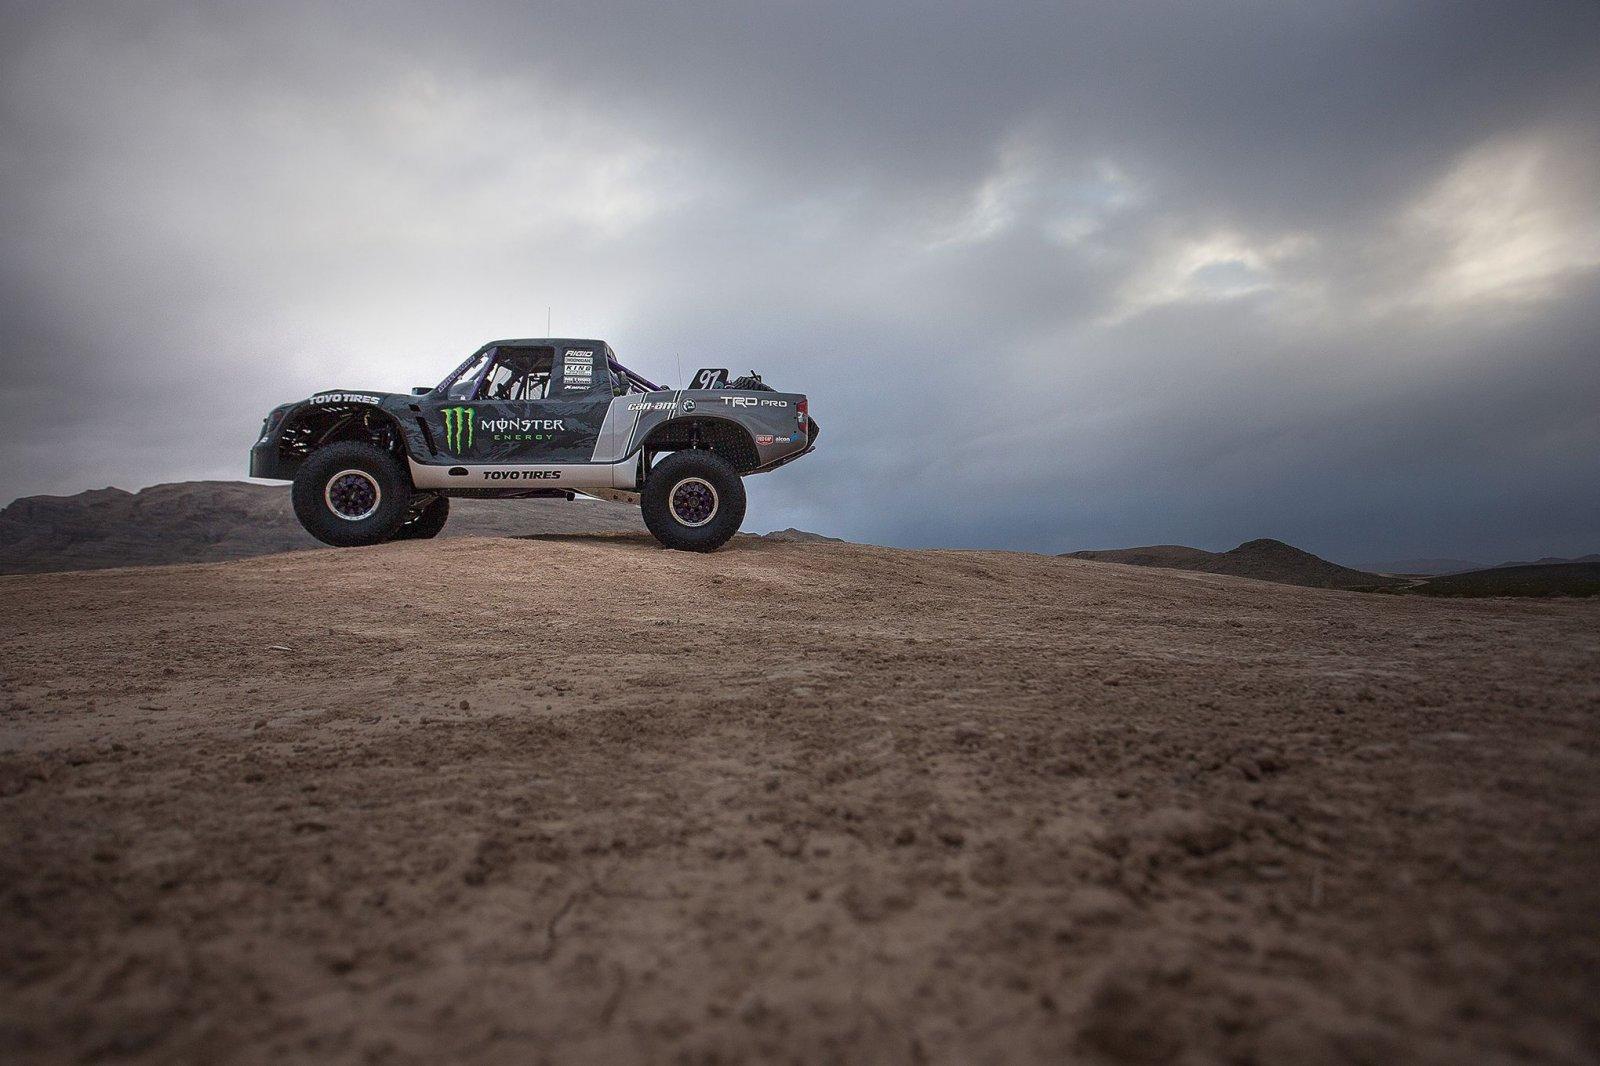 toyota-bj-baldwin-tundra-trd-pro-trophy-truck-002.jpg